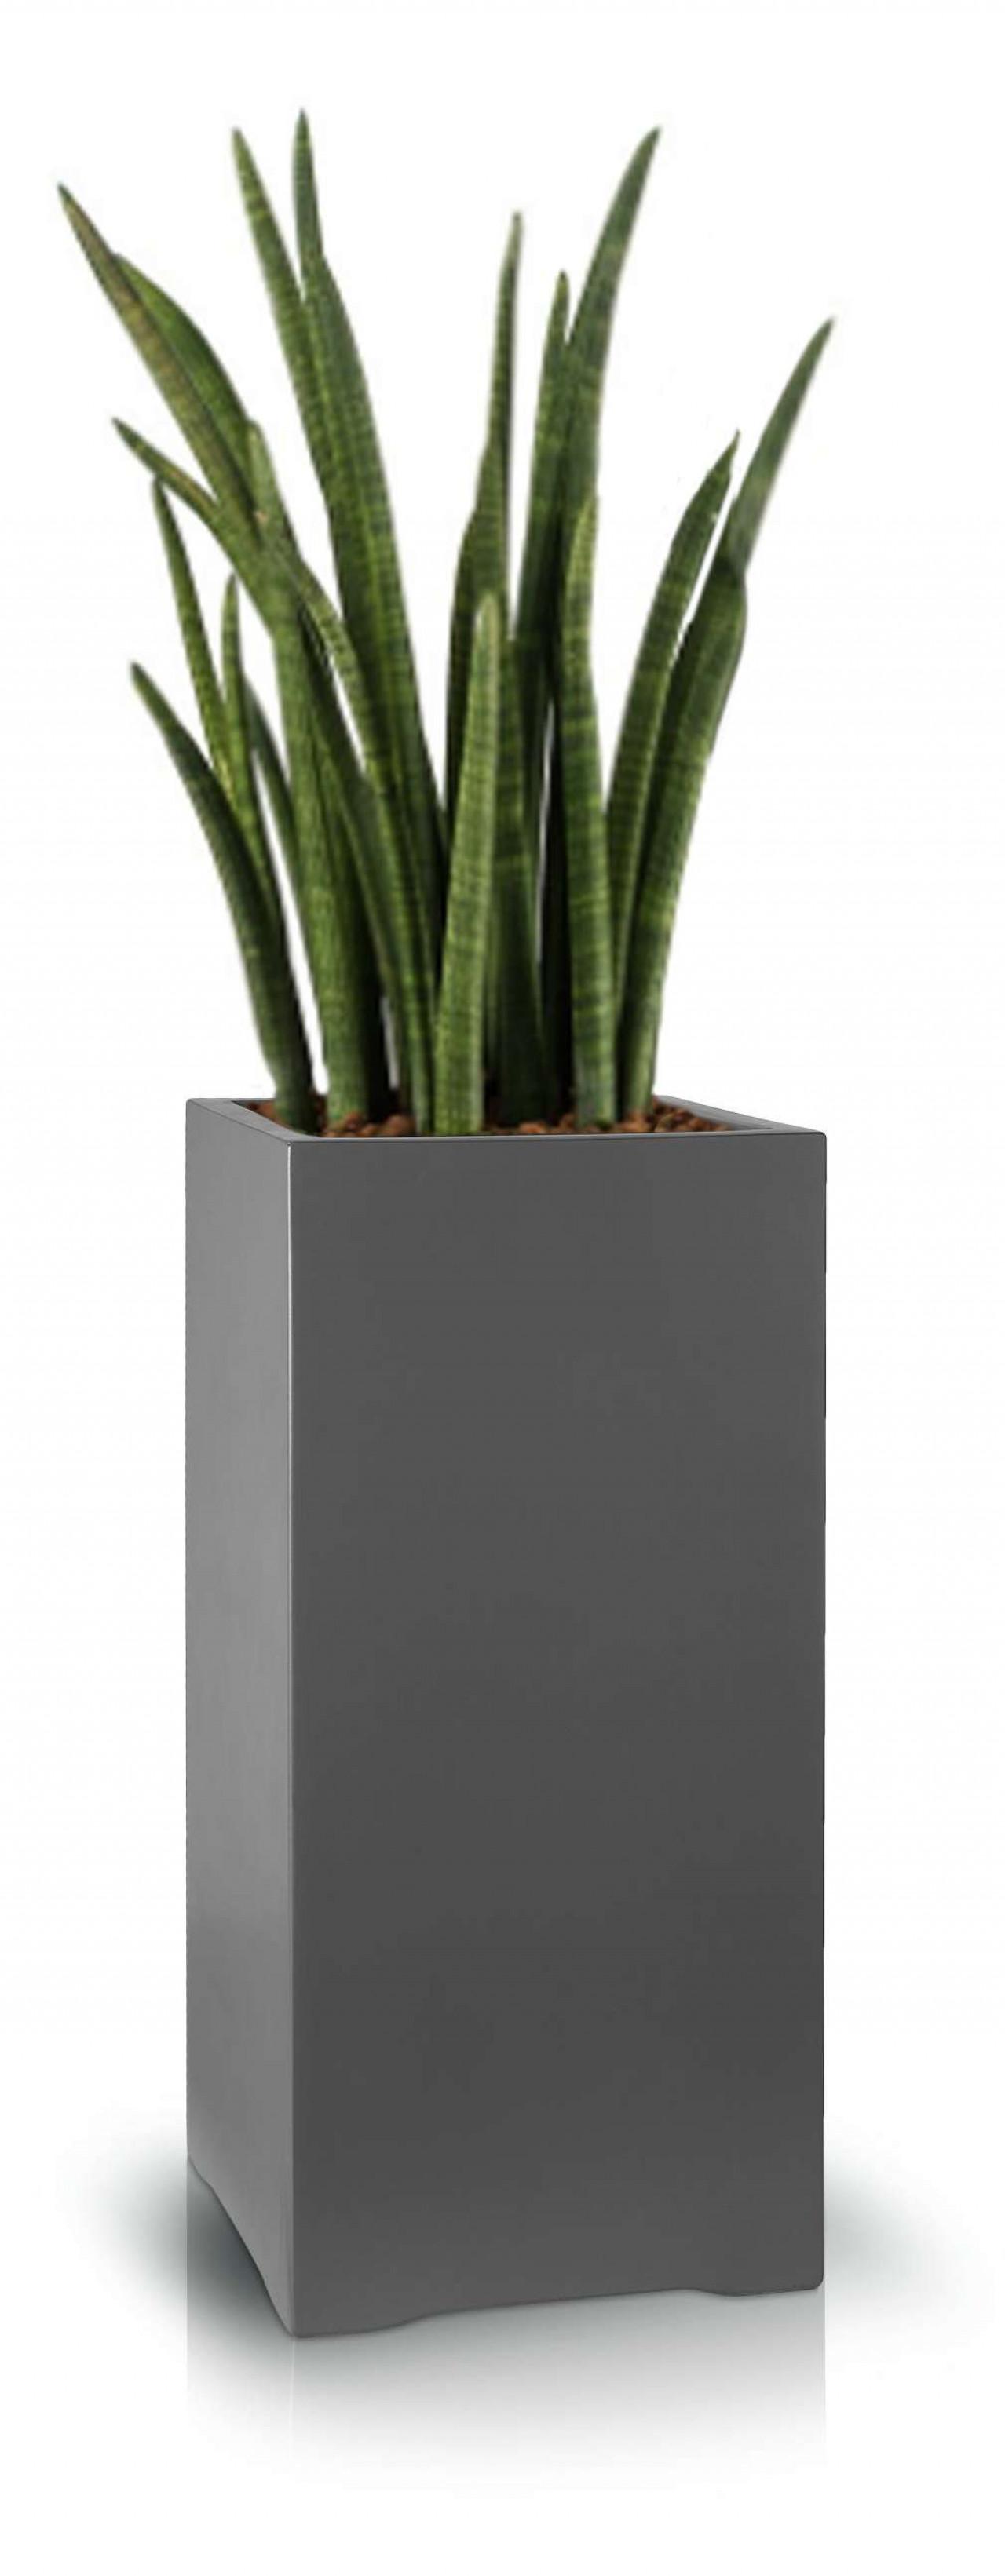 Donica Fiberglass 800 x 400 mm 95.018.80